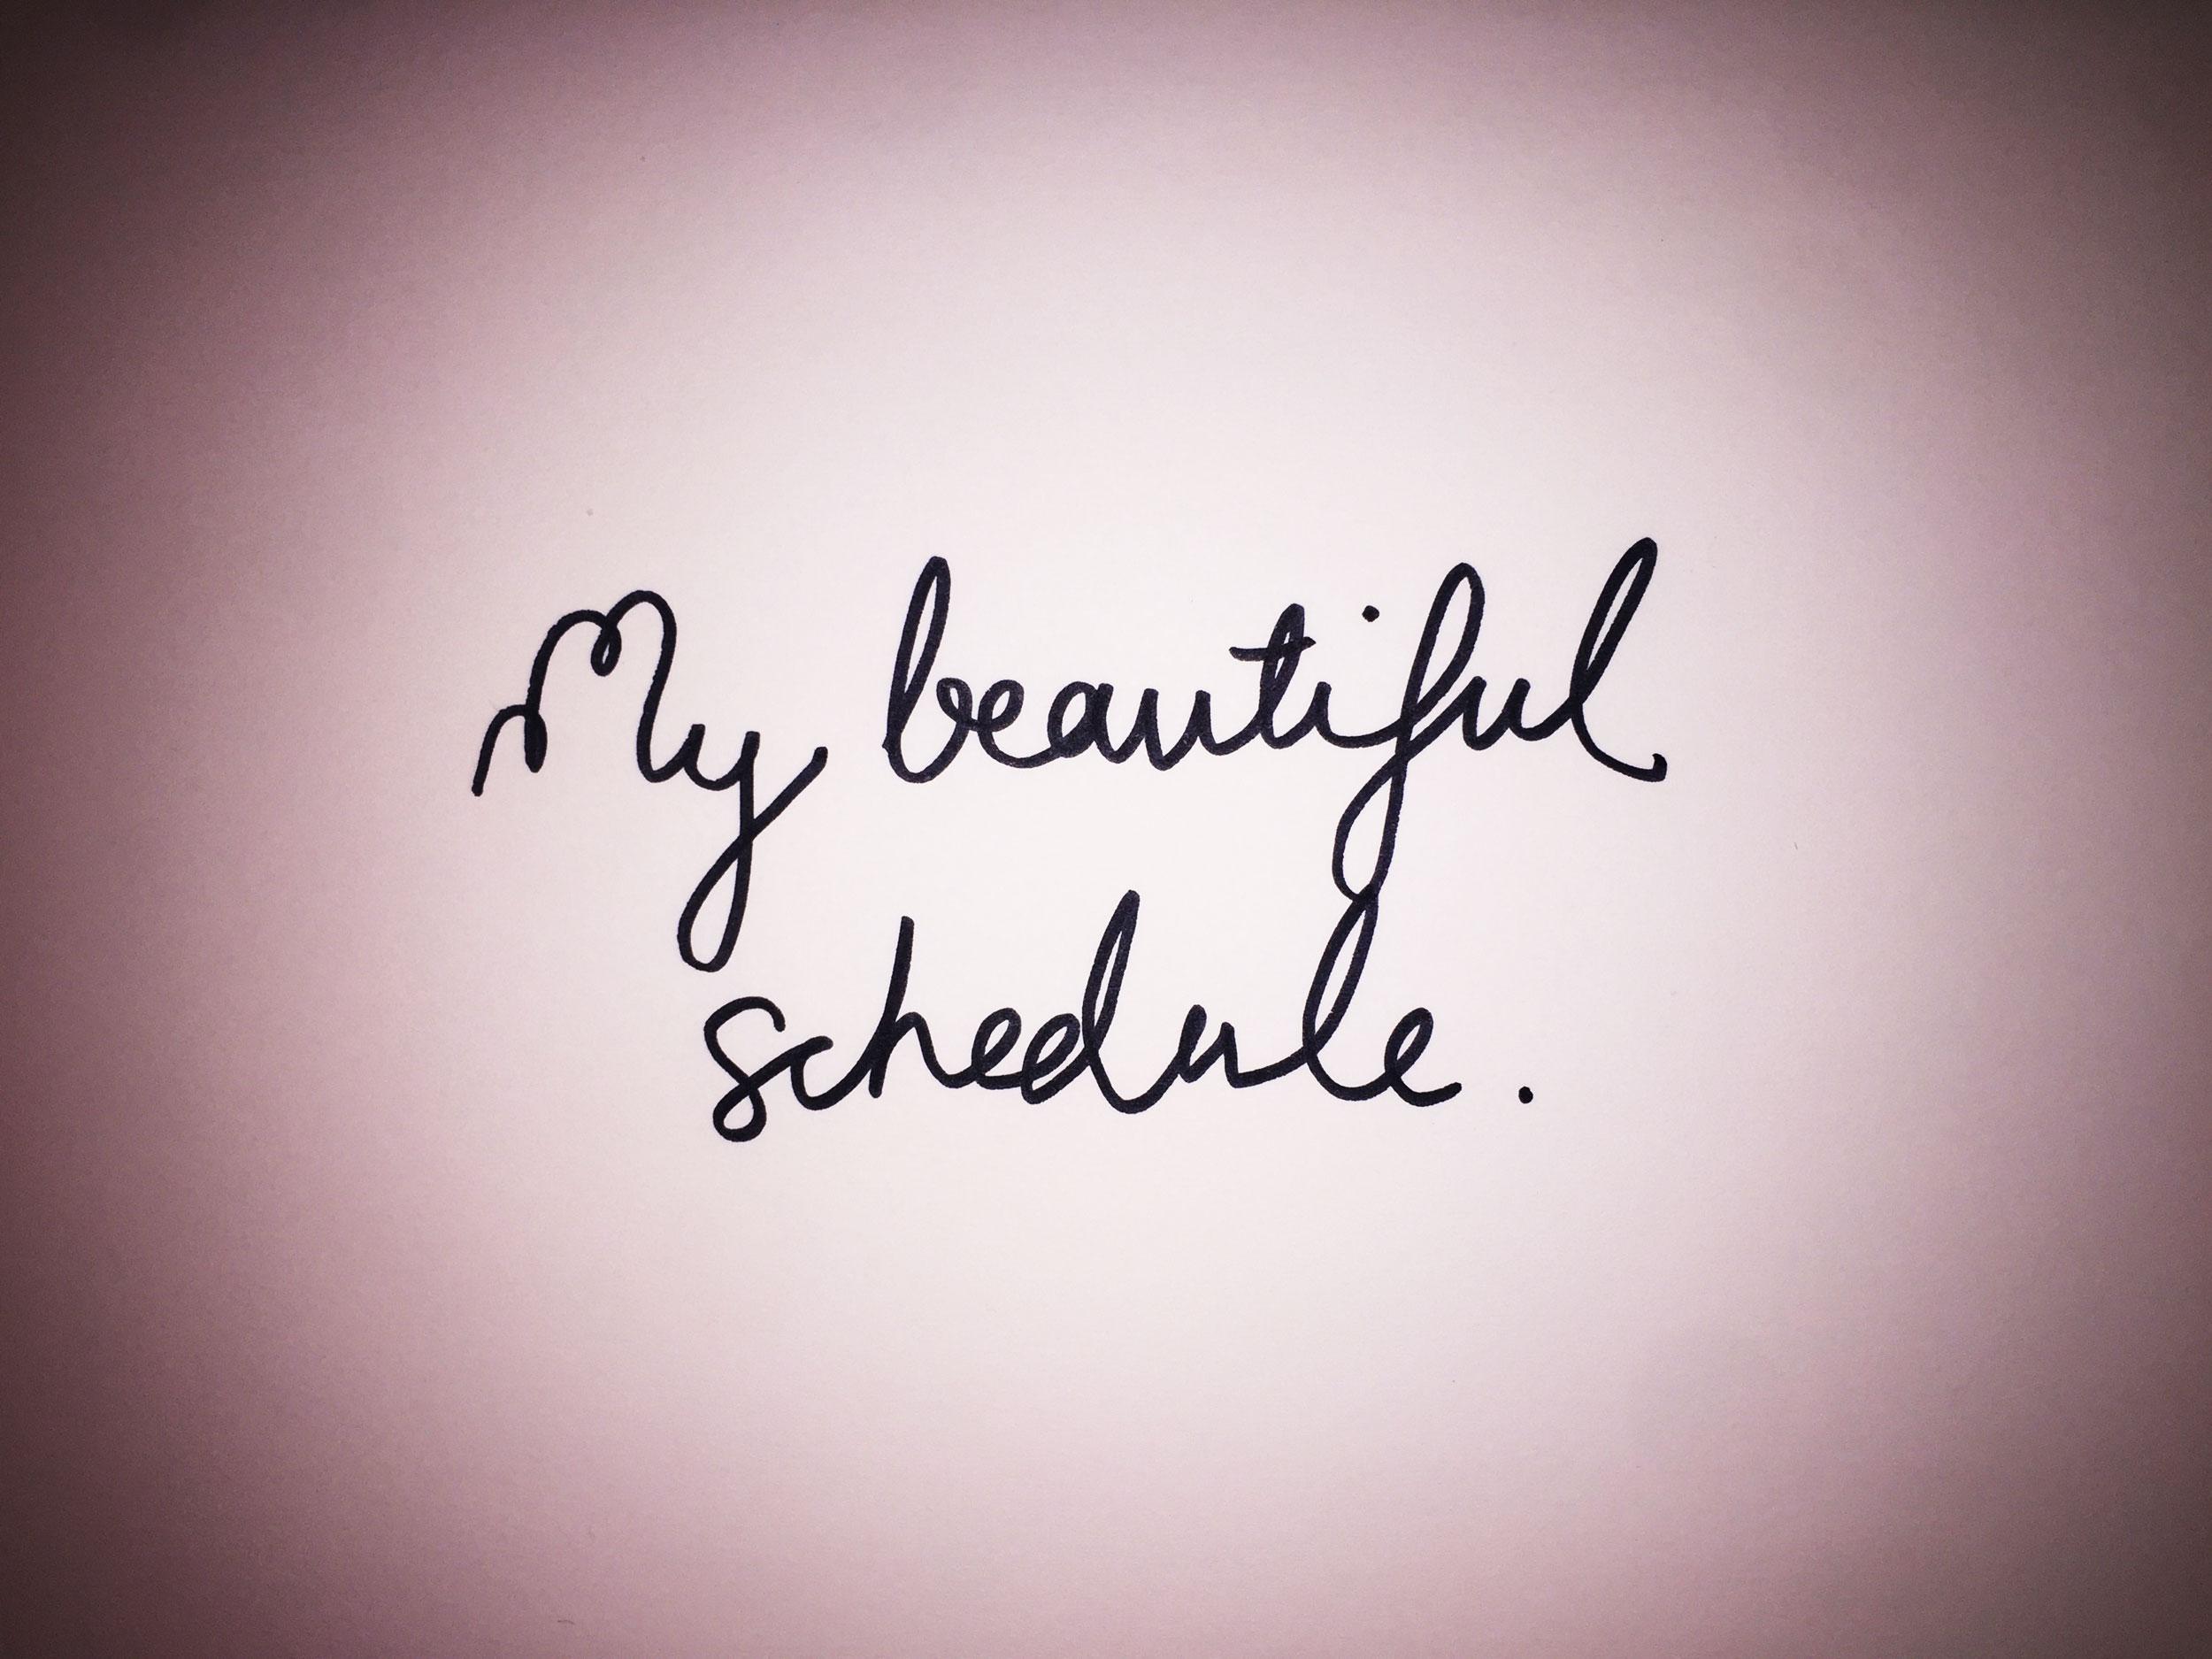 My beautiful schedule. Drawing Luke Hockley.